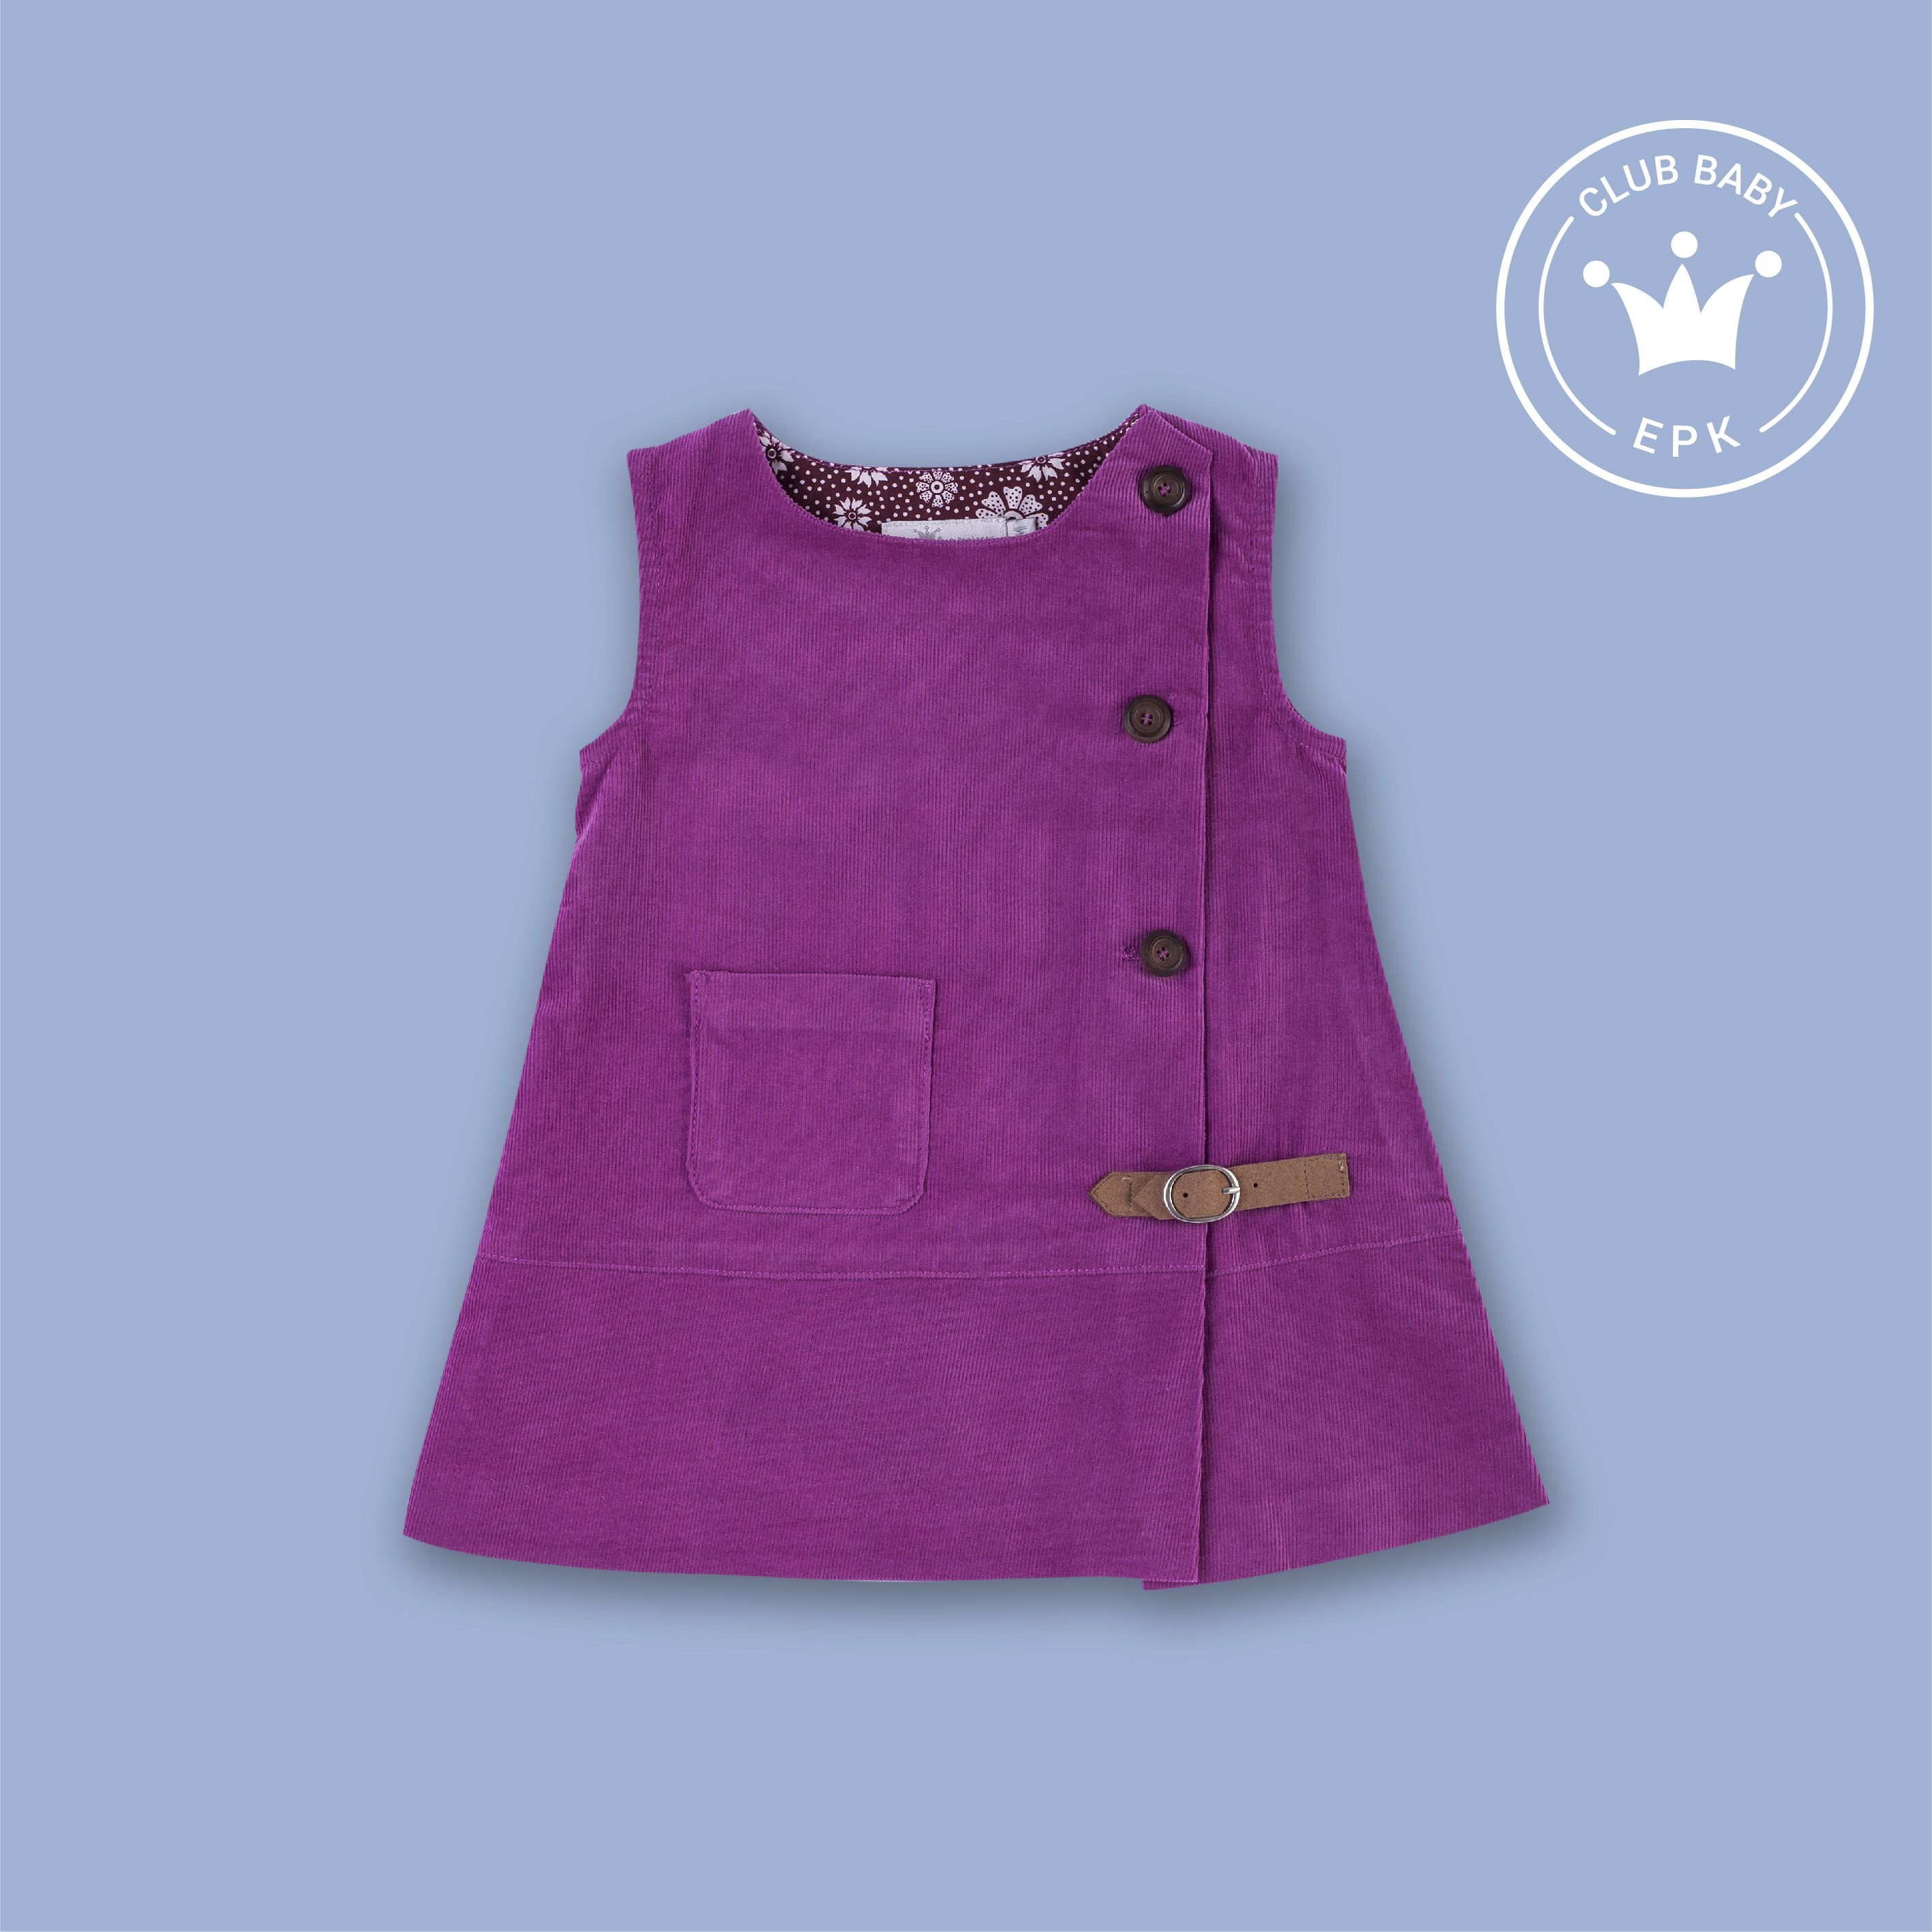 Pin de Jessica Colindres en Fashion Girls.   Pinterest   Perú, Otoño ...